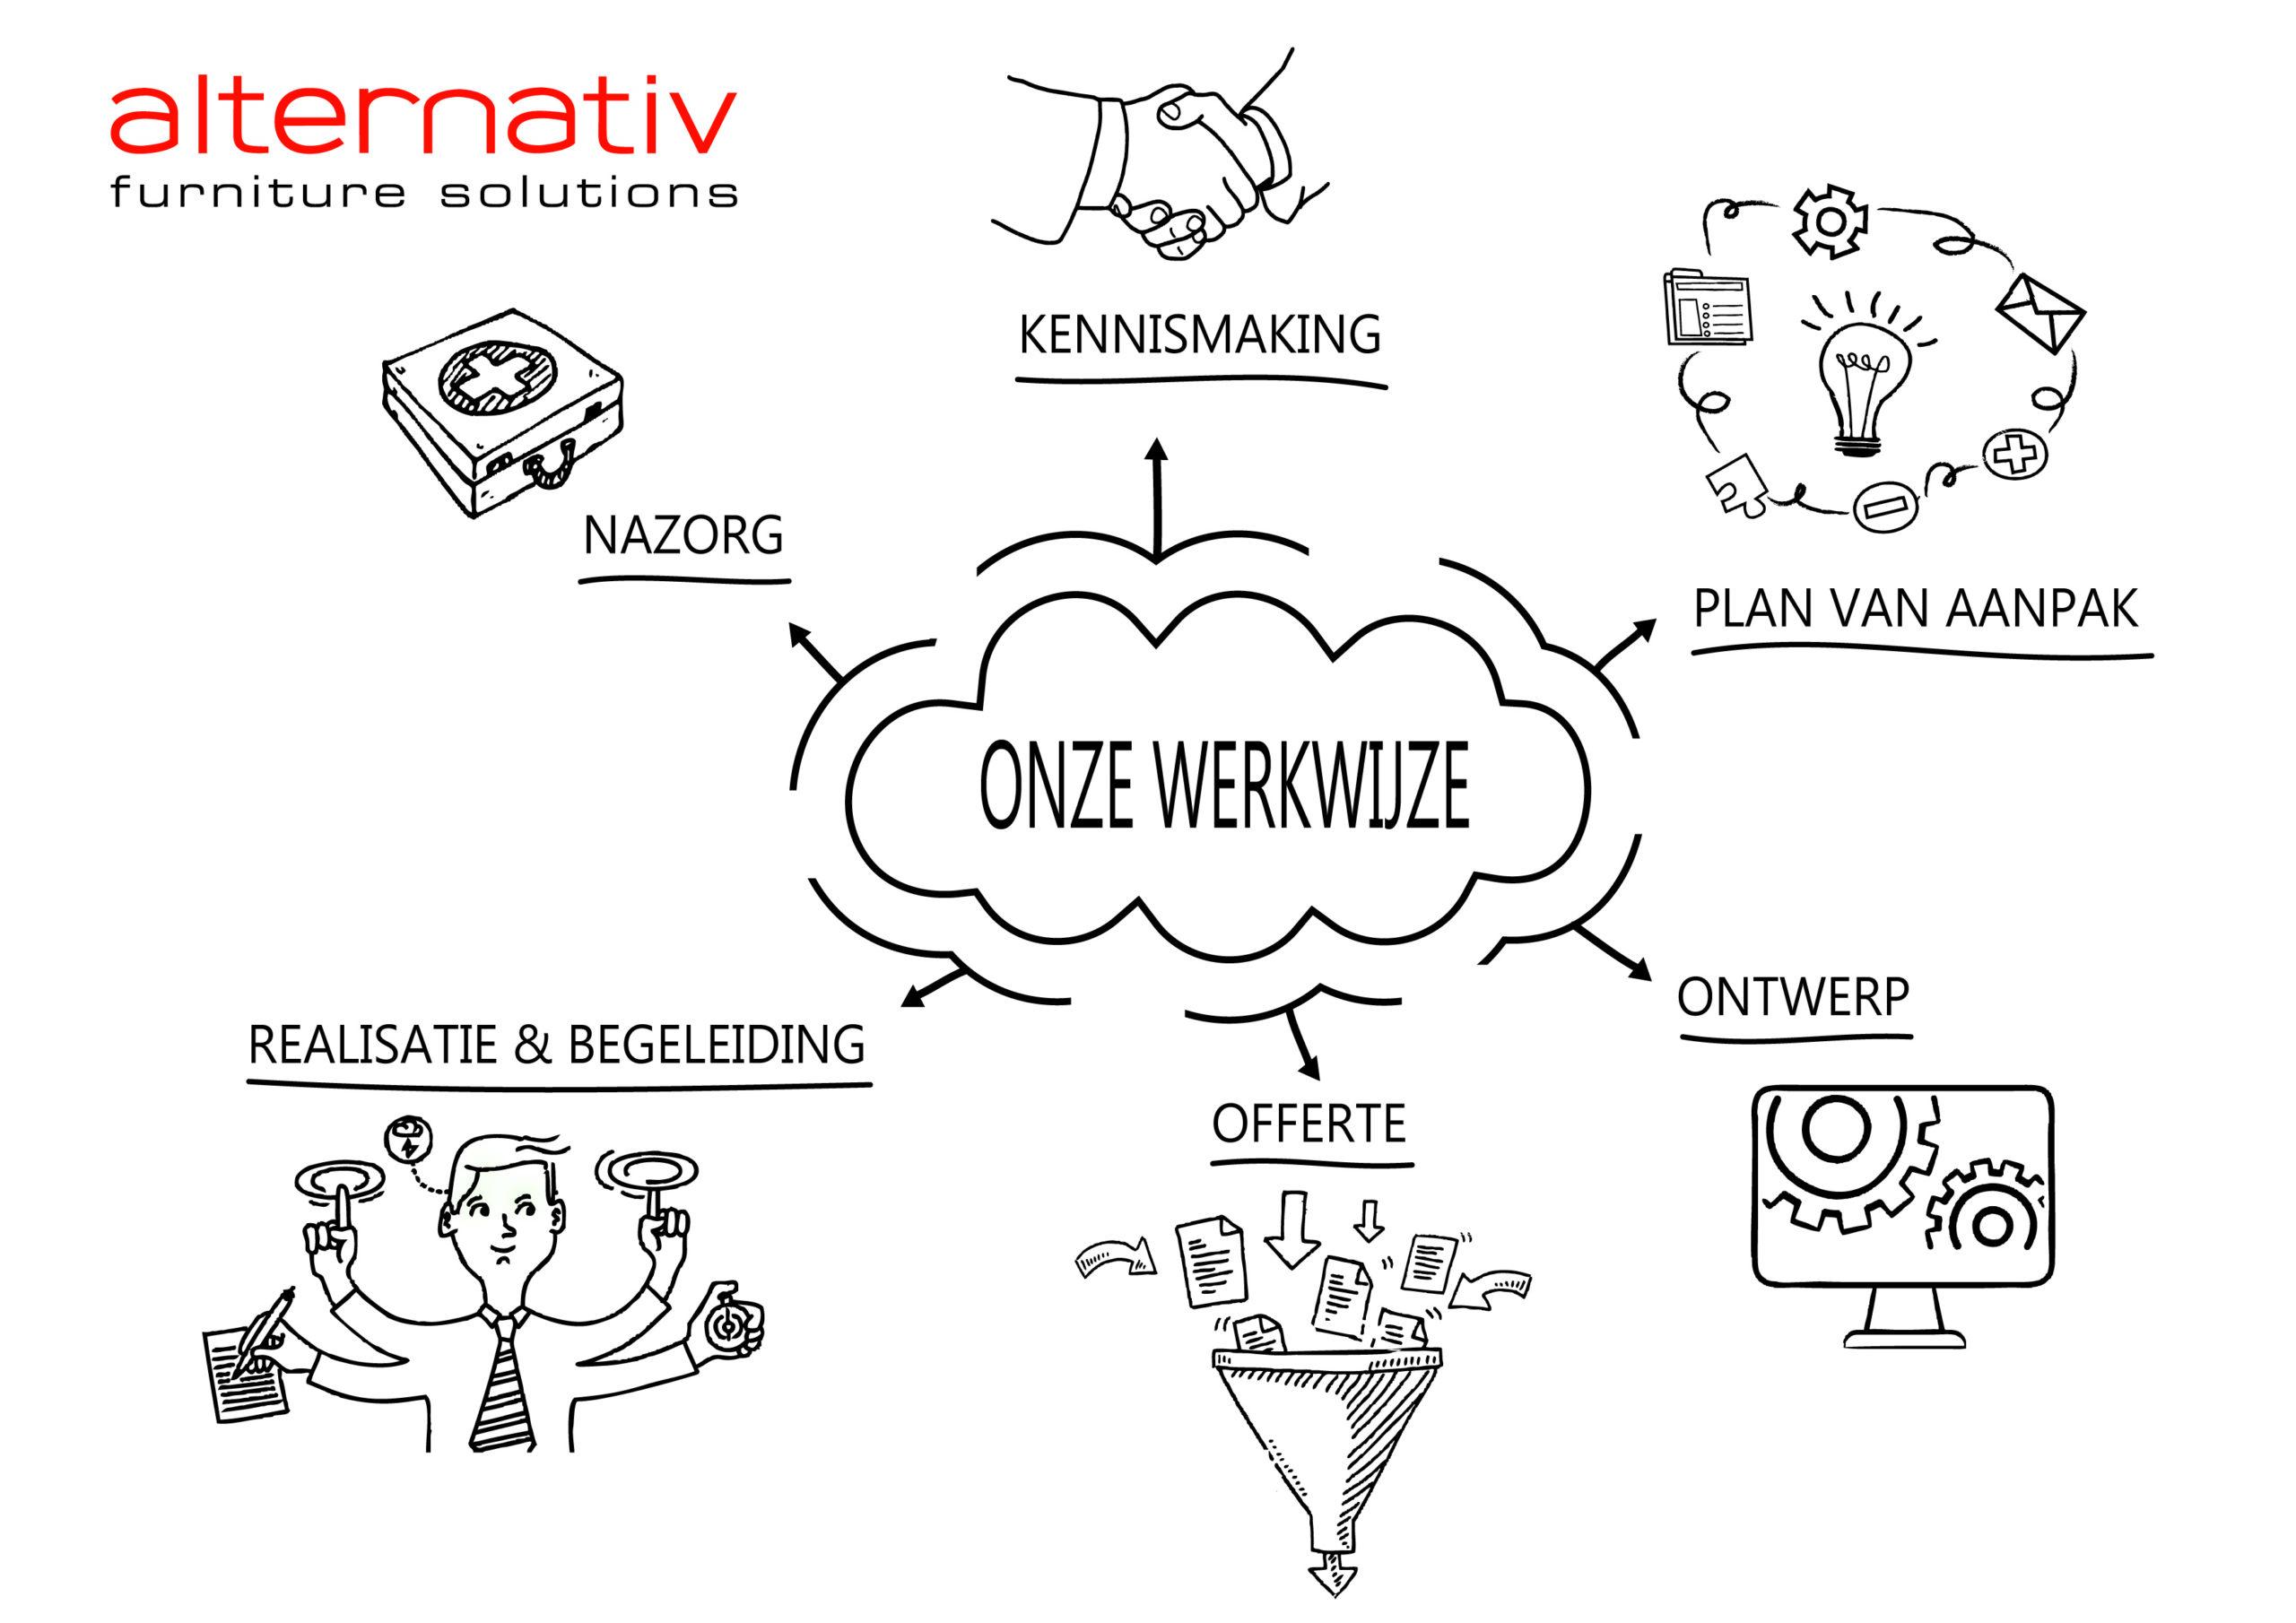 https://alternativ.nl/wp-content/uploads/2019/12/Onze-werkwijze-1-scaled.jpg